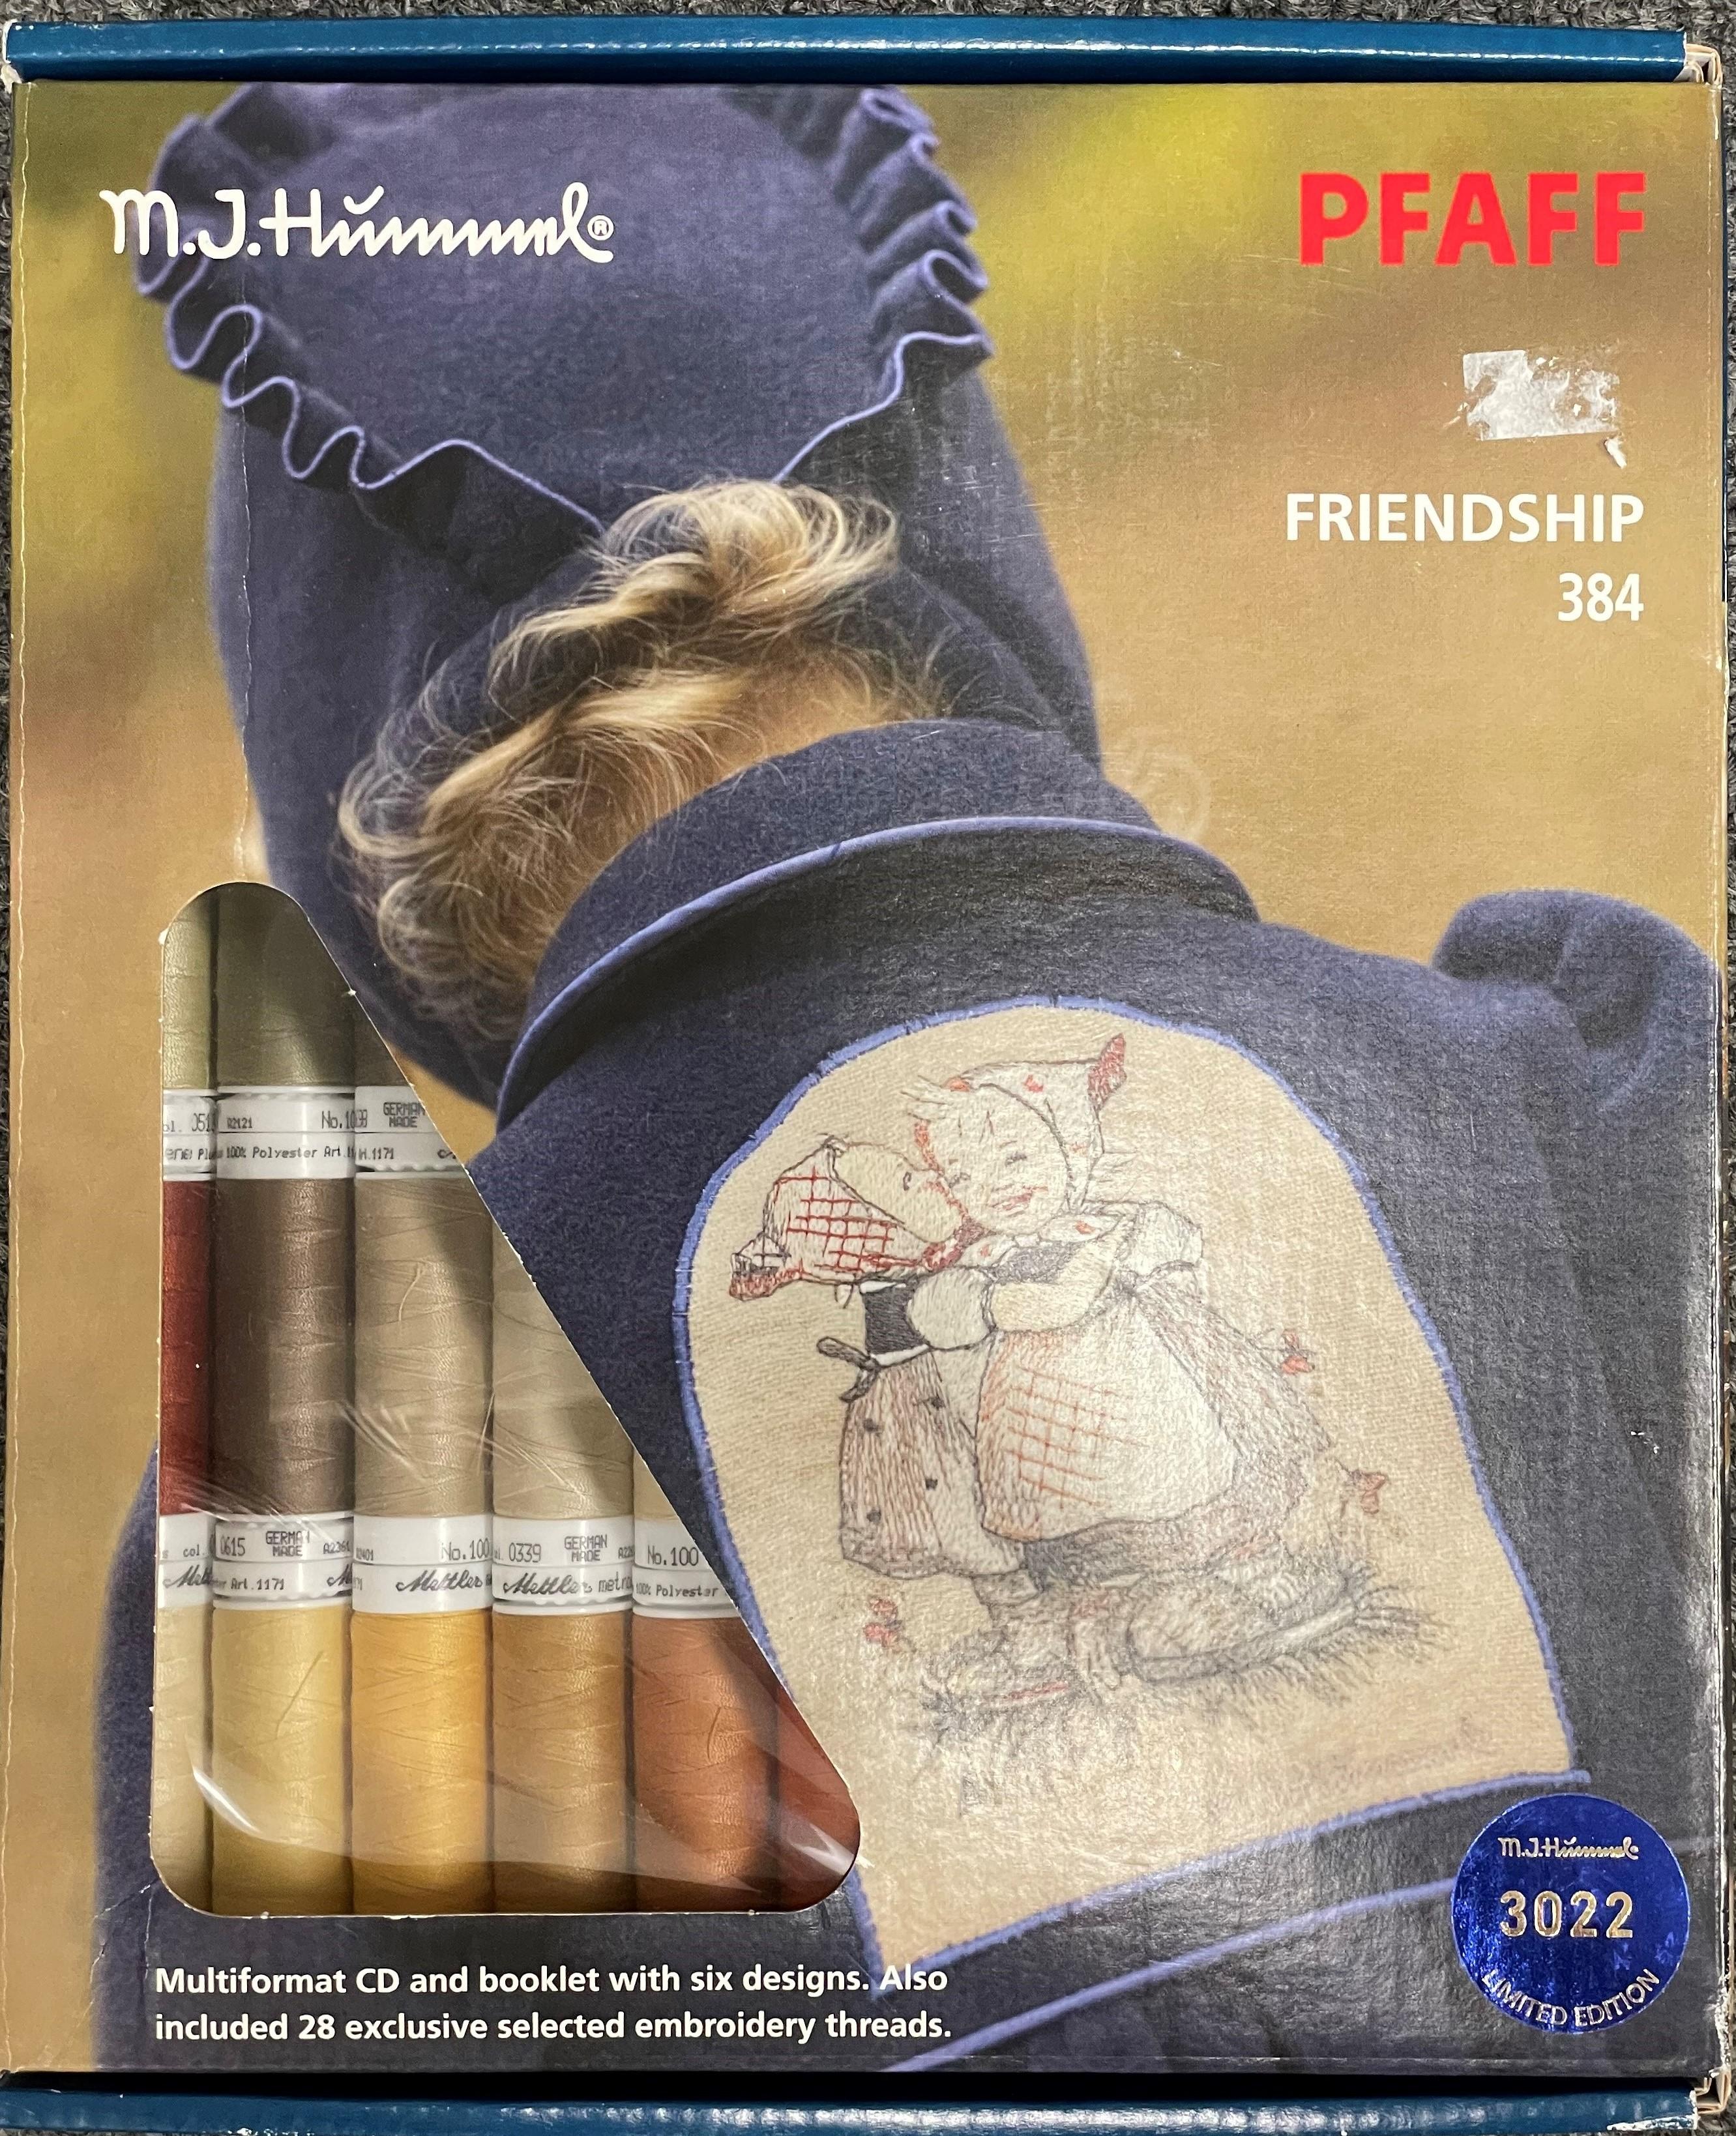 Pfaff M.J. Hummel Friendship 384 Multi-Format Embroidery Design Book and CD